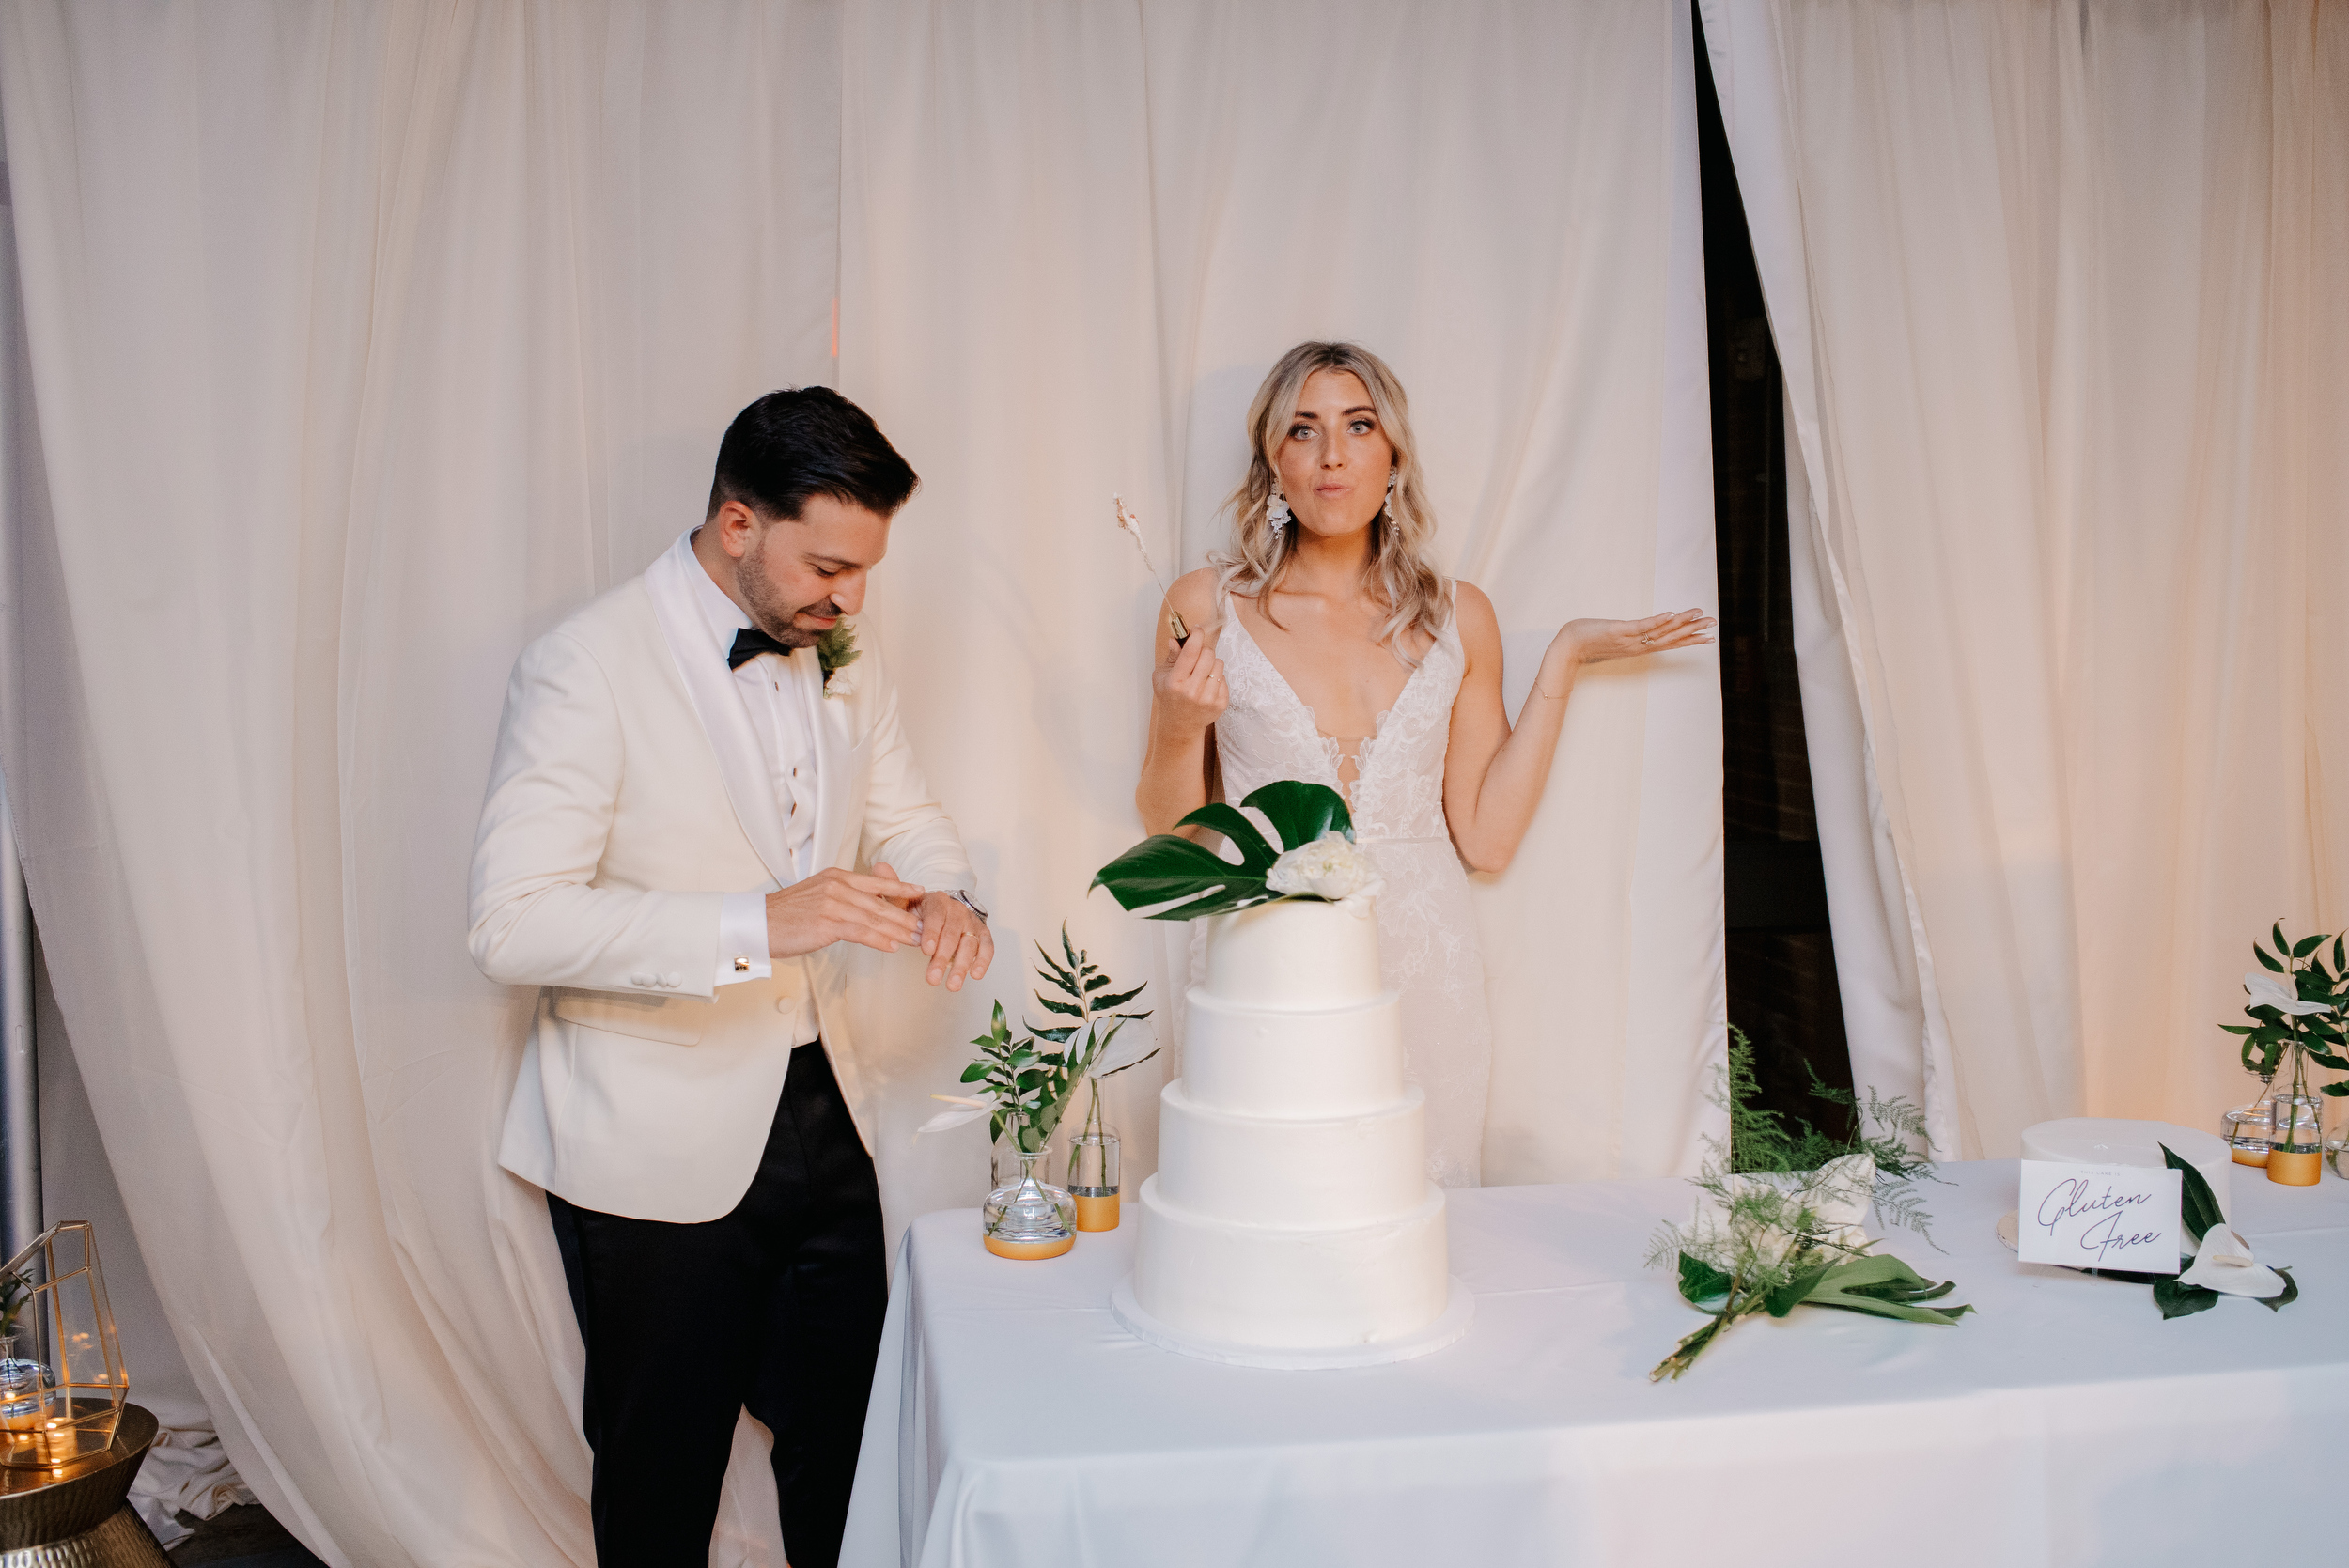 the_hotel_salem_wedding_mikhail_glabets_50.JPG